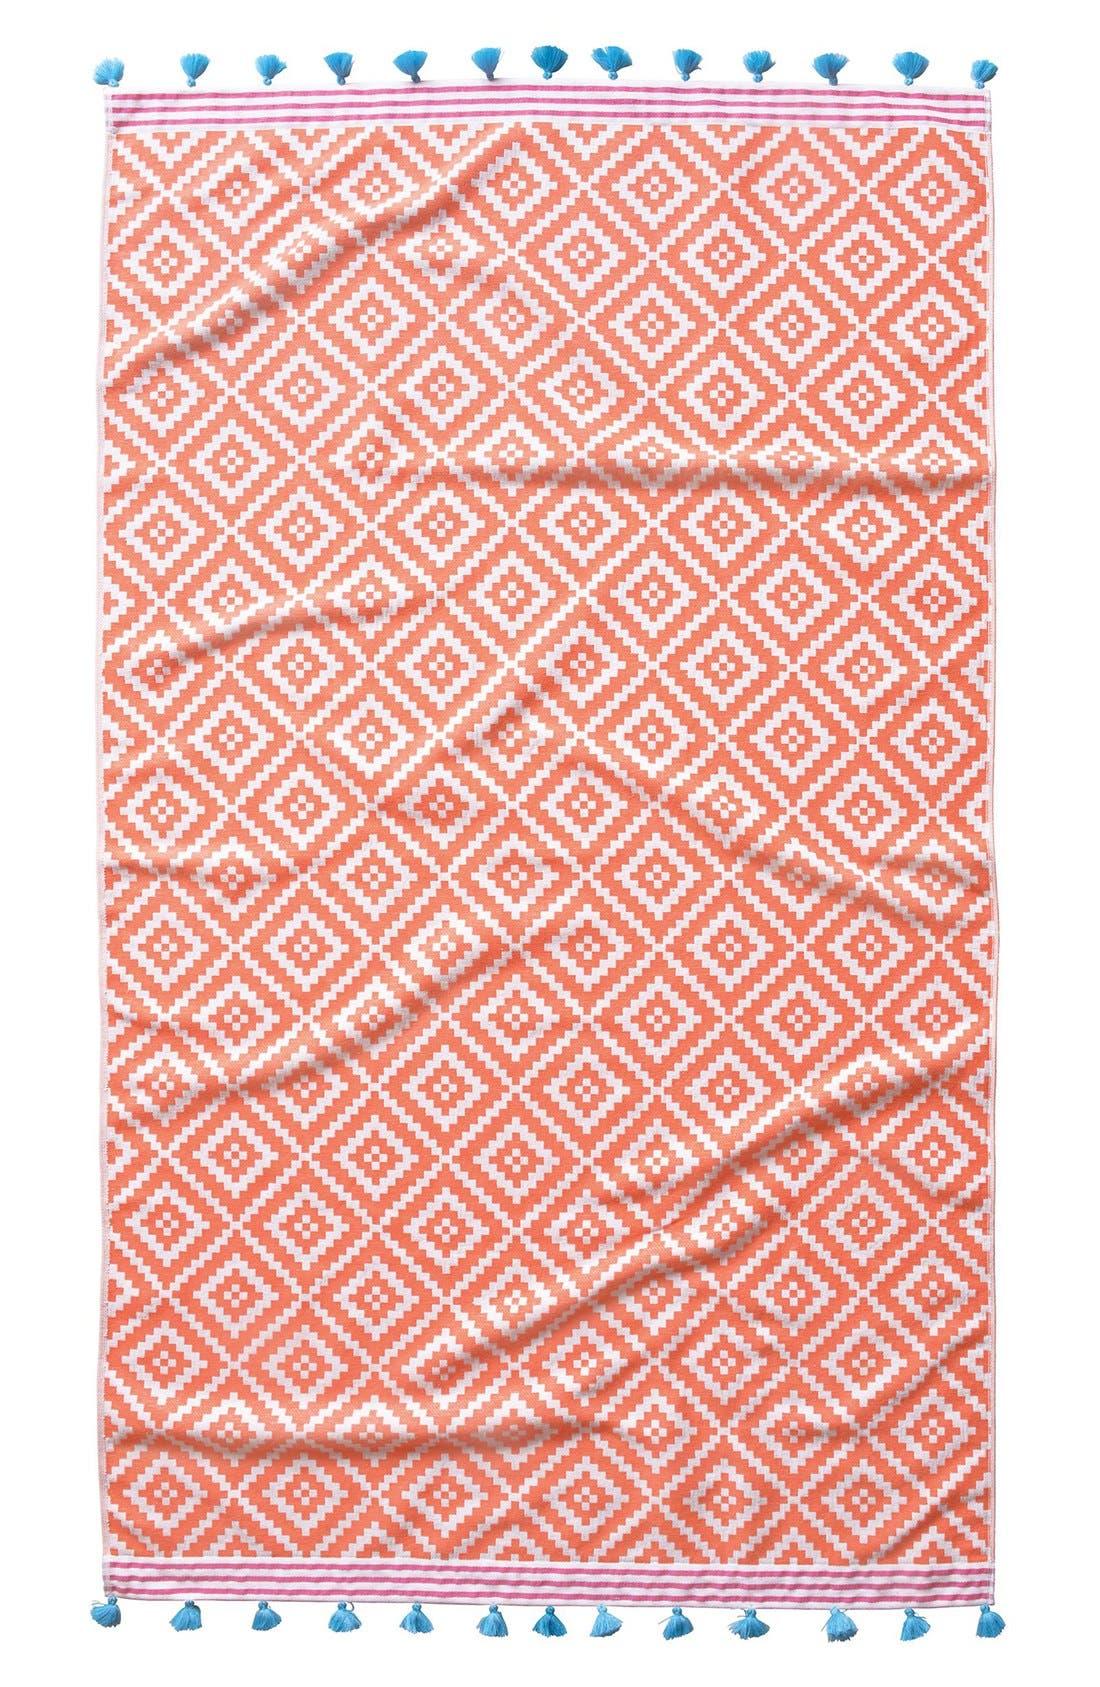 Alternate Image 1 Selected - John Robshaw 'Alabat' Beach Towel